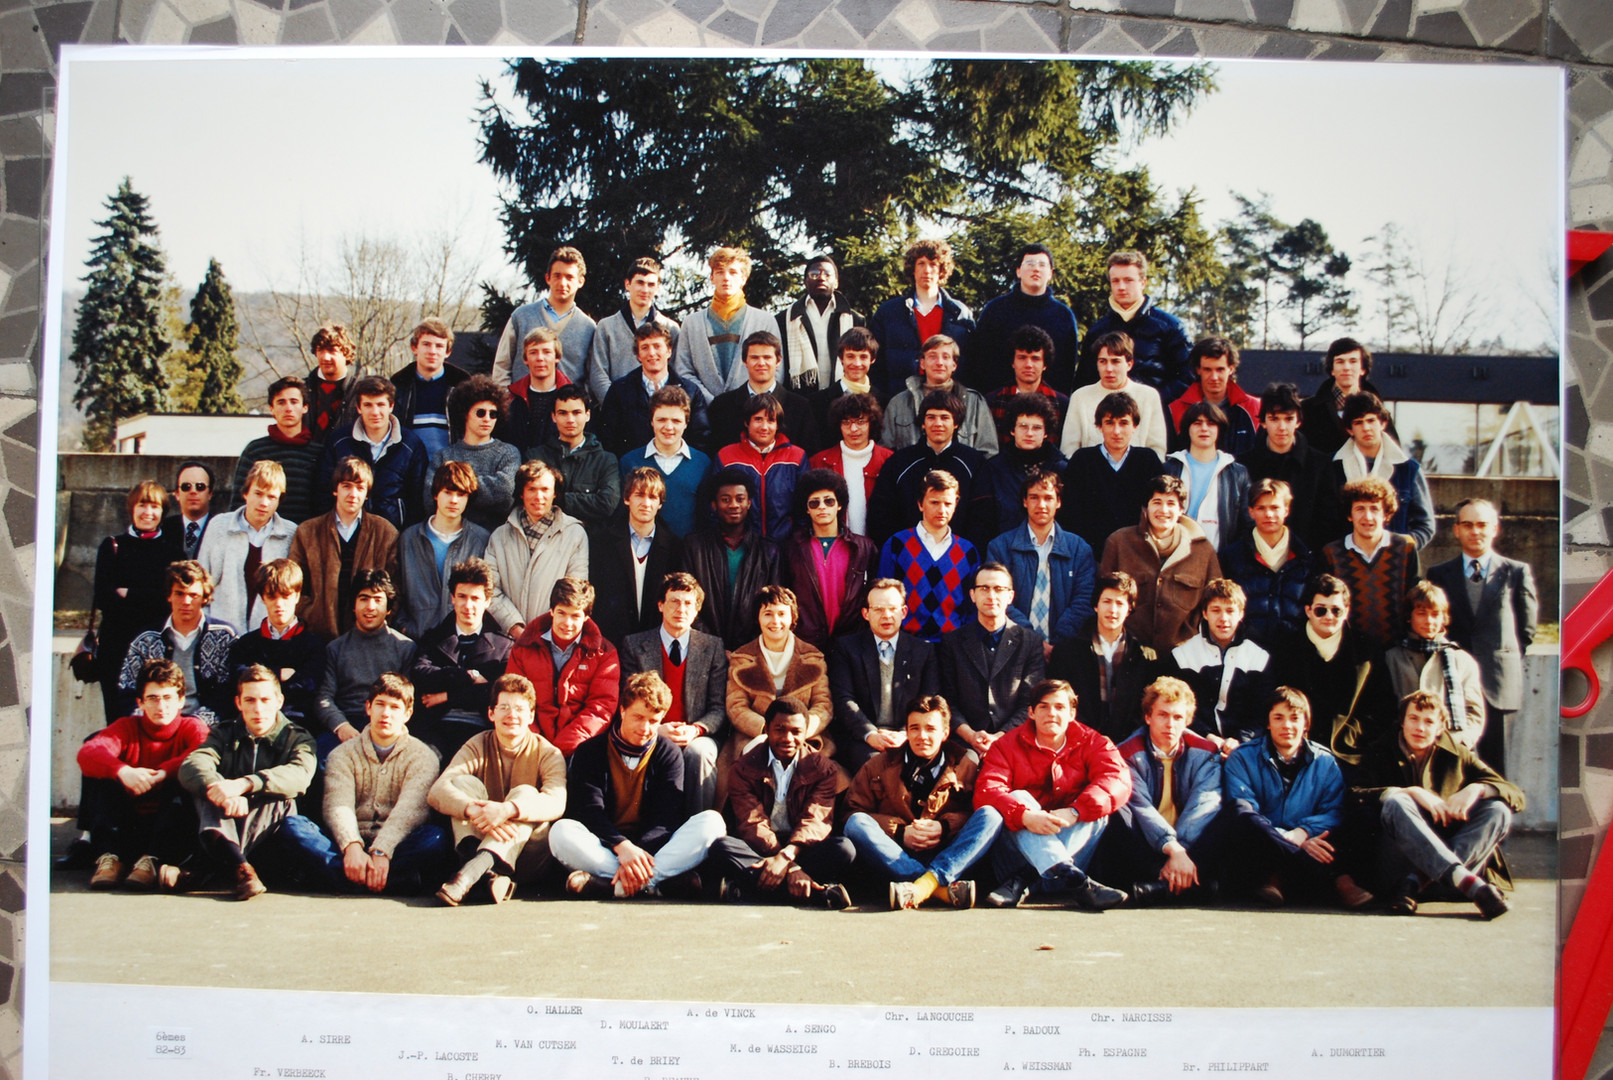 1982-1983-O.JPG